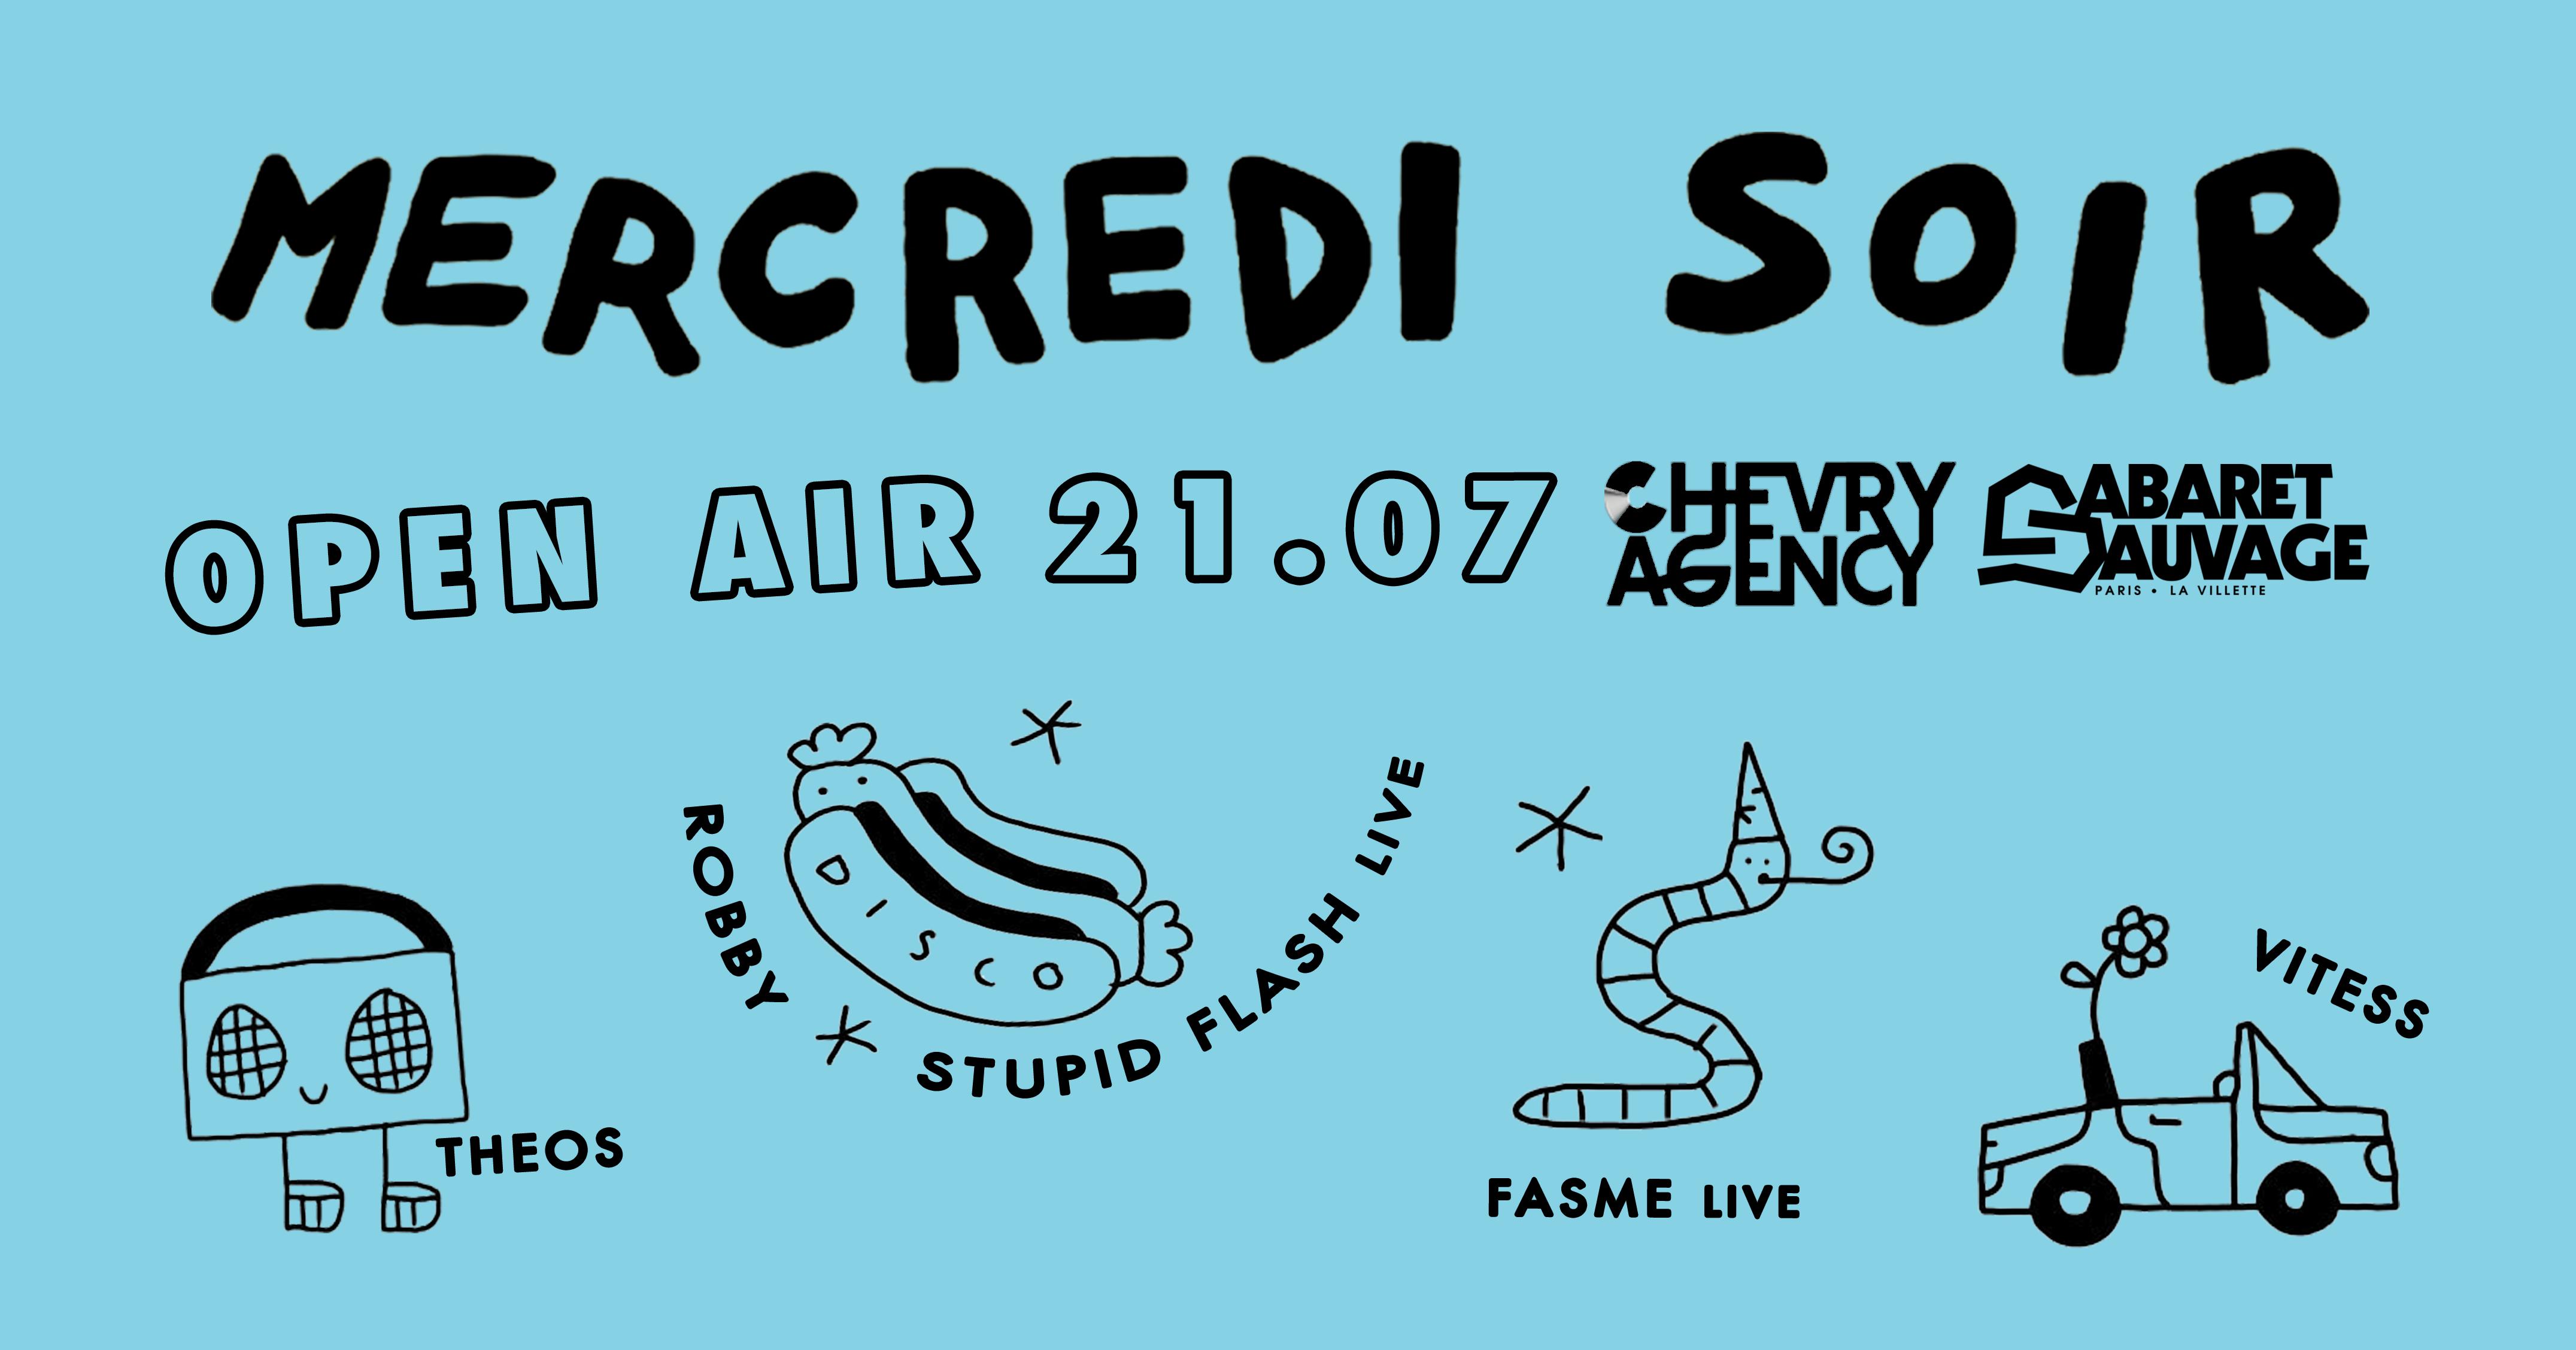 Mercredi Soir x Chevry Agency : Fasme Live, Vitess and more